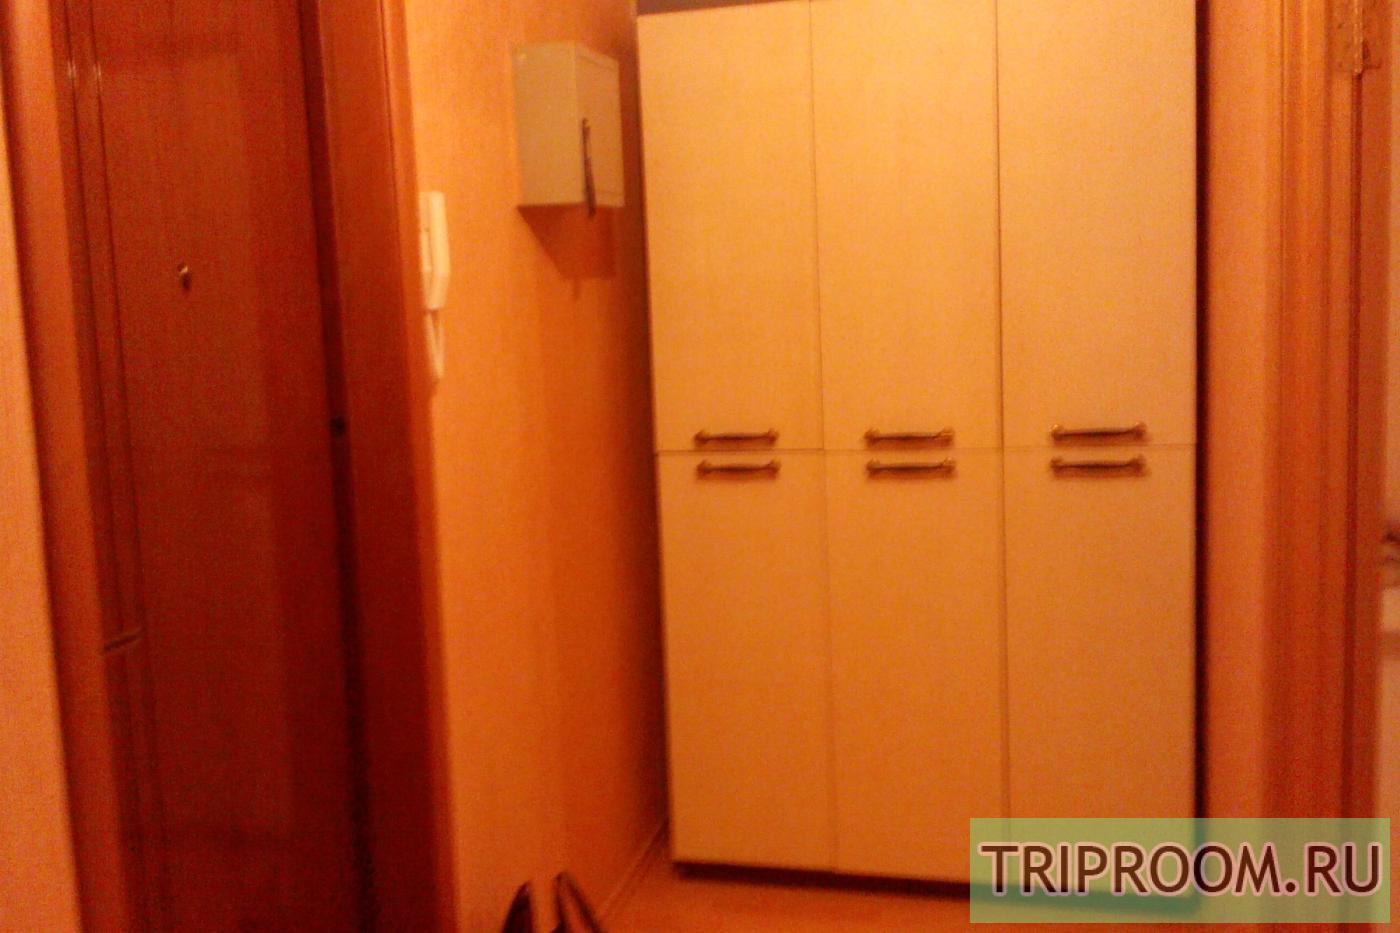 1-комнатная квартира посуточно (вариант № 16704), ул. Доватора улица, фото № 15